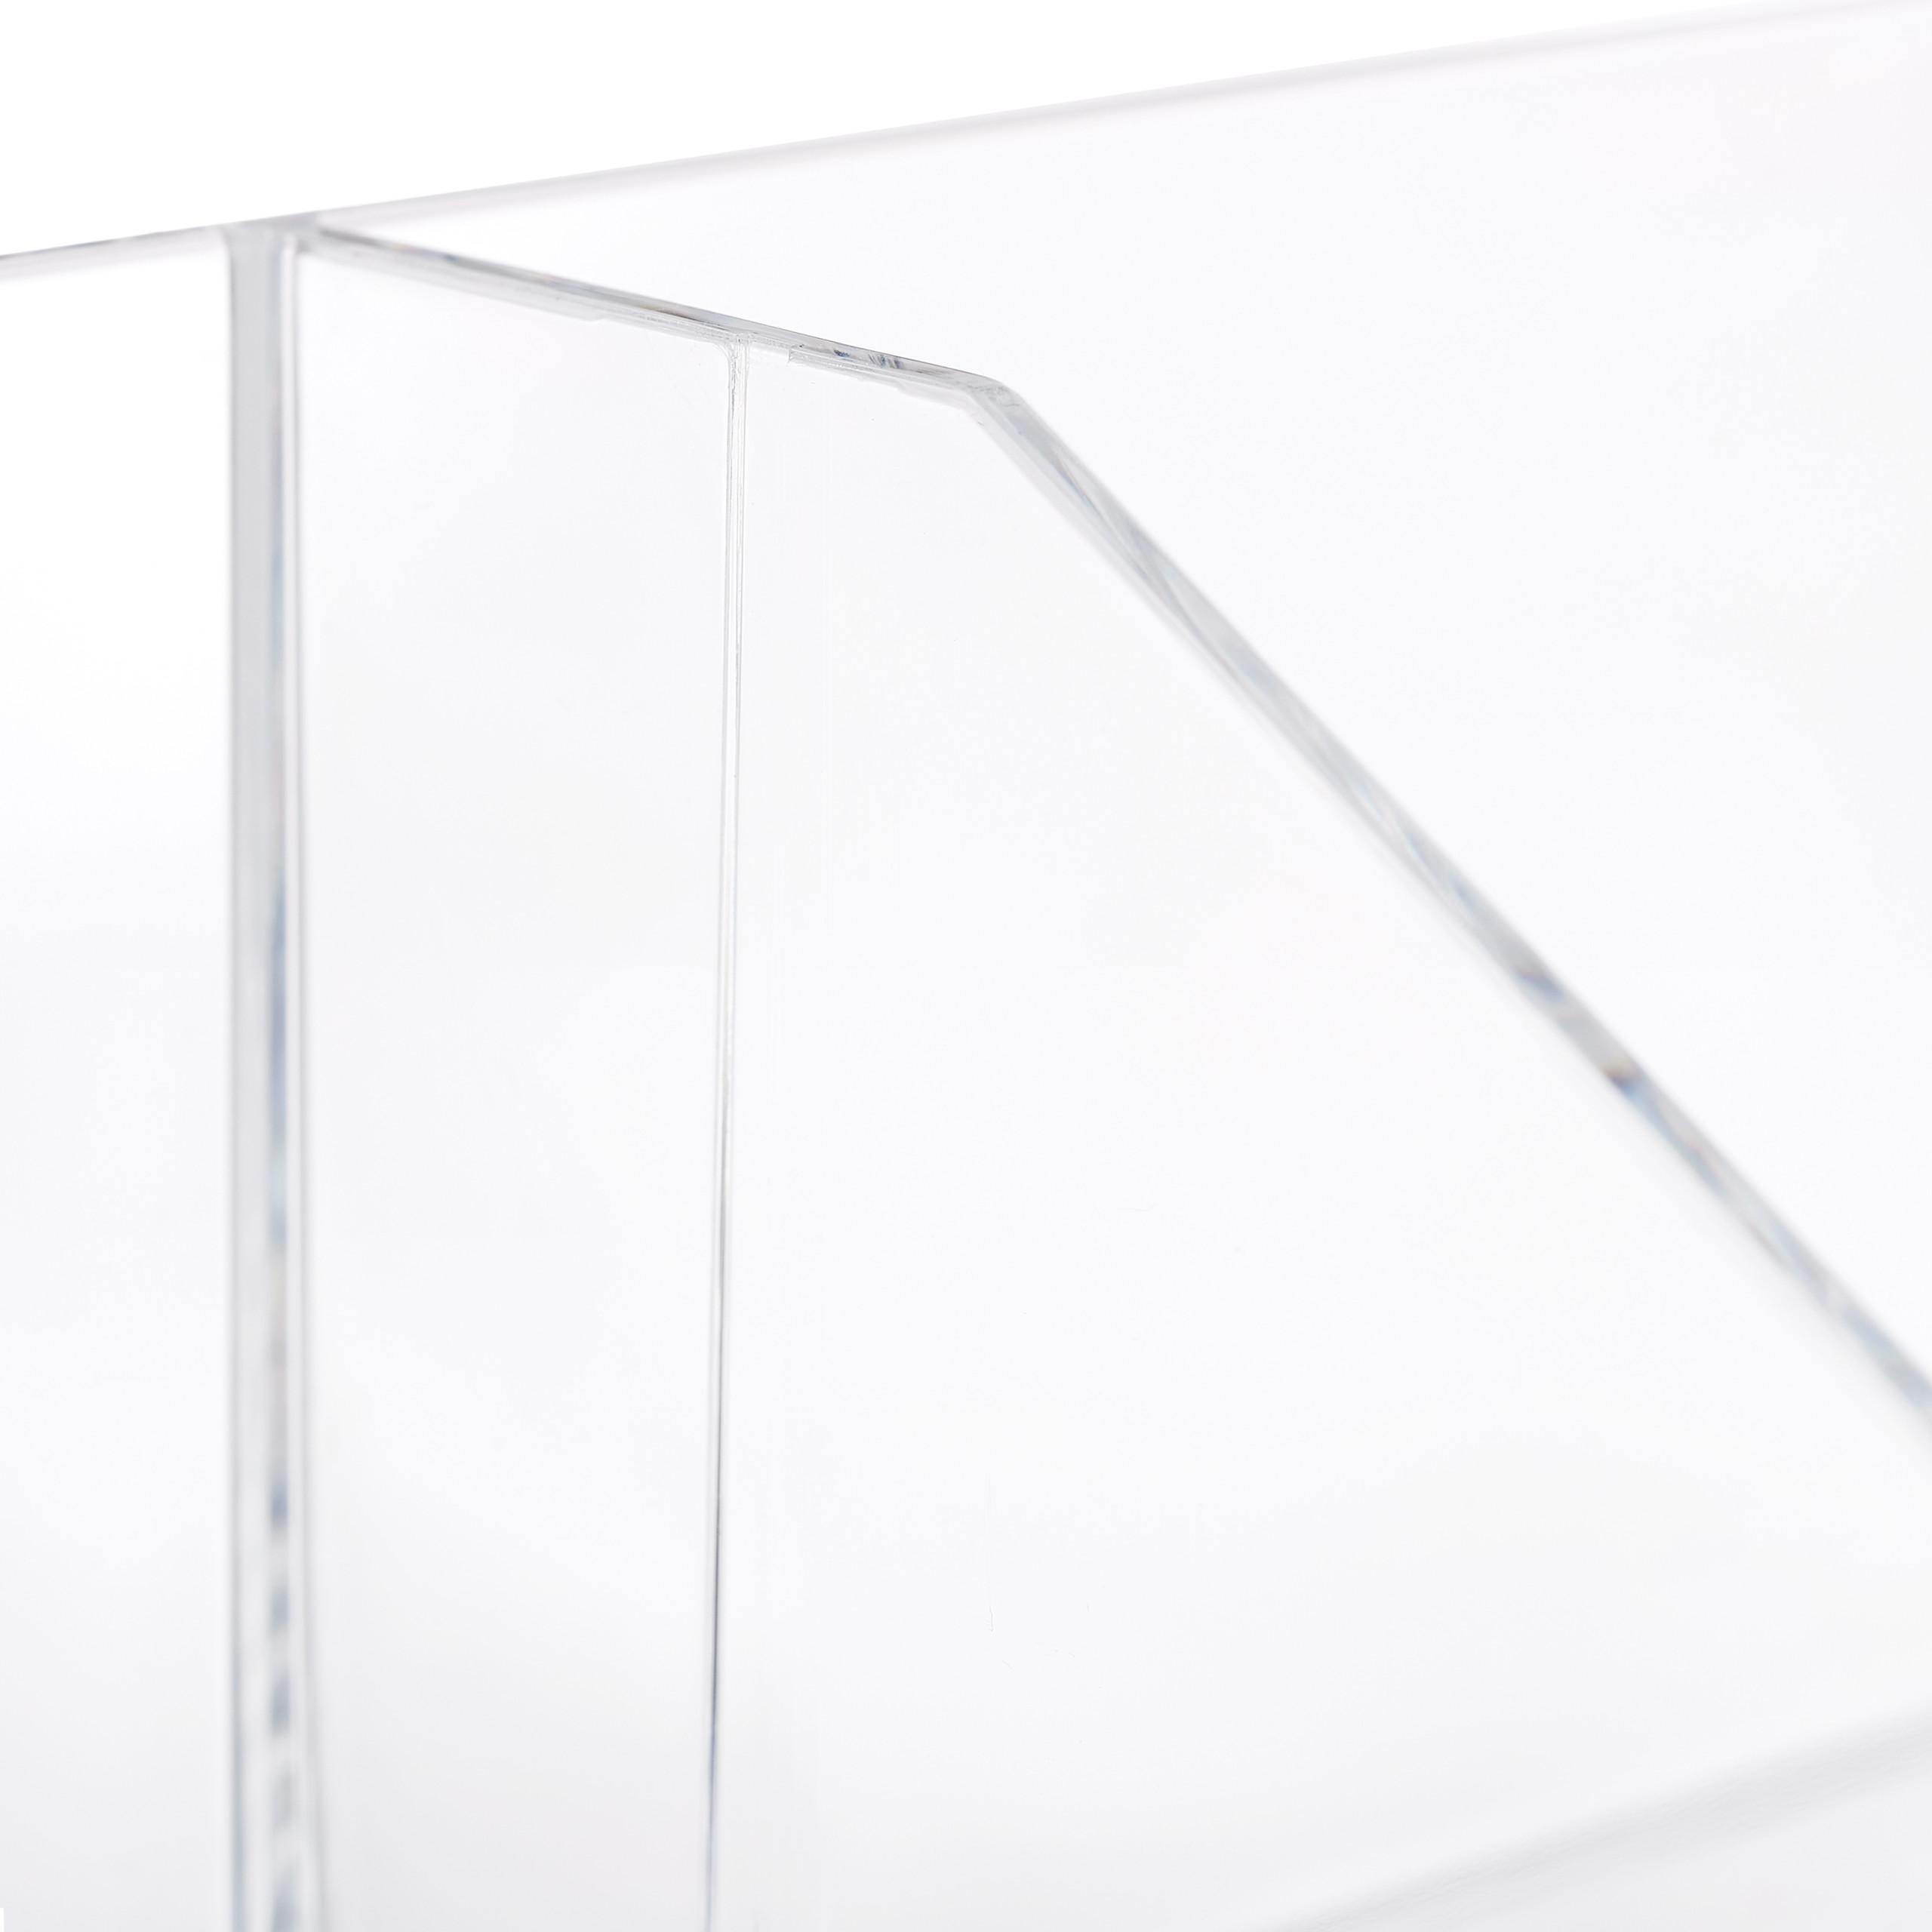 make-up-organizer-cosmetica-organizer-acryl-2-vakken-badkamer-opbergen miniatuur 8